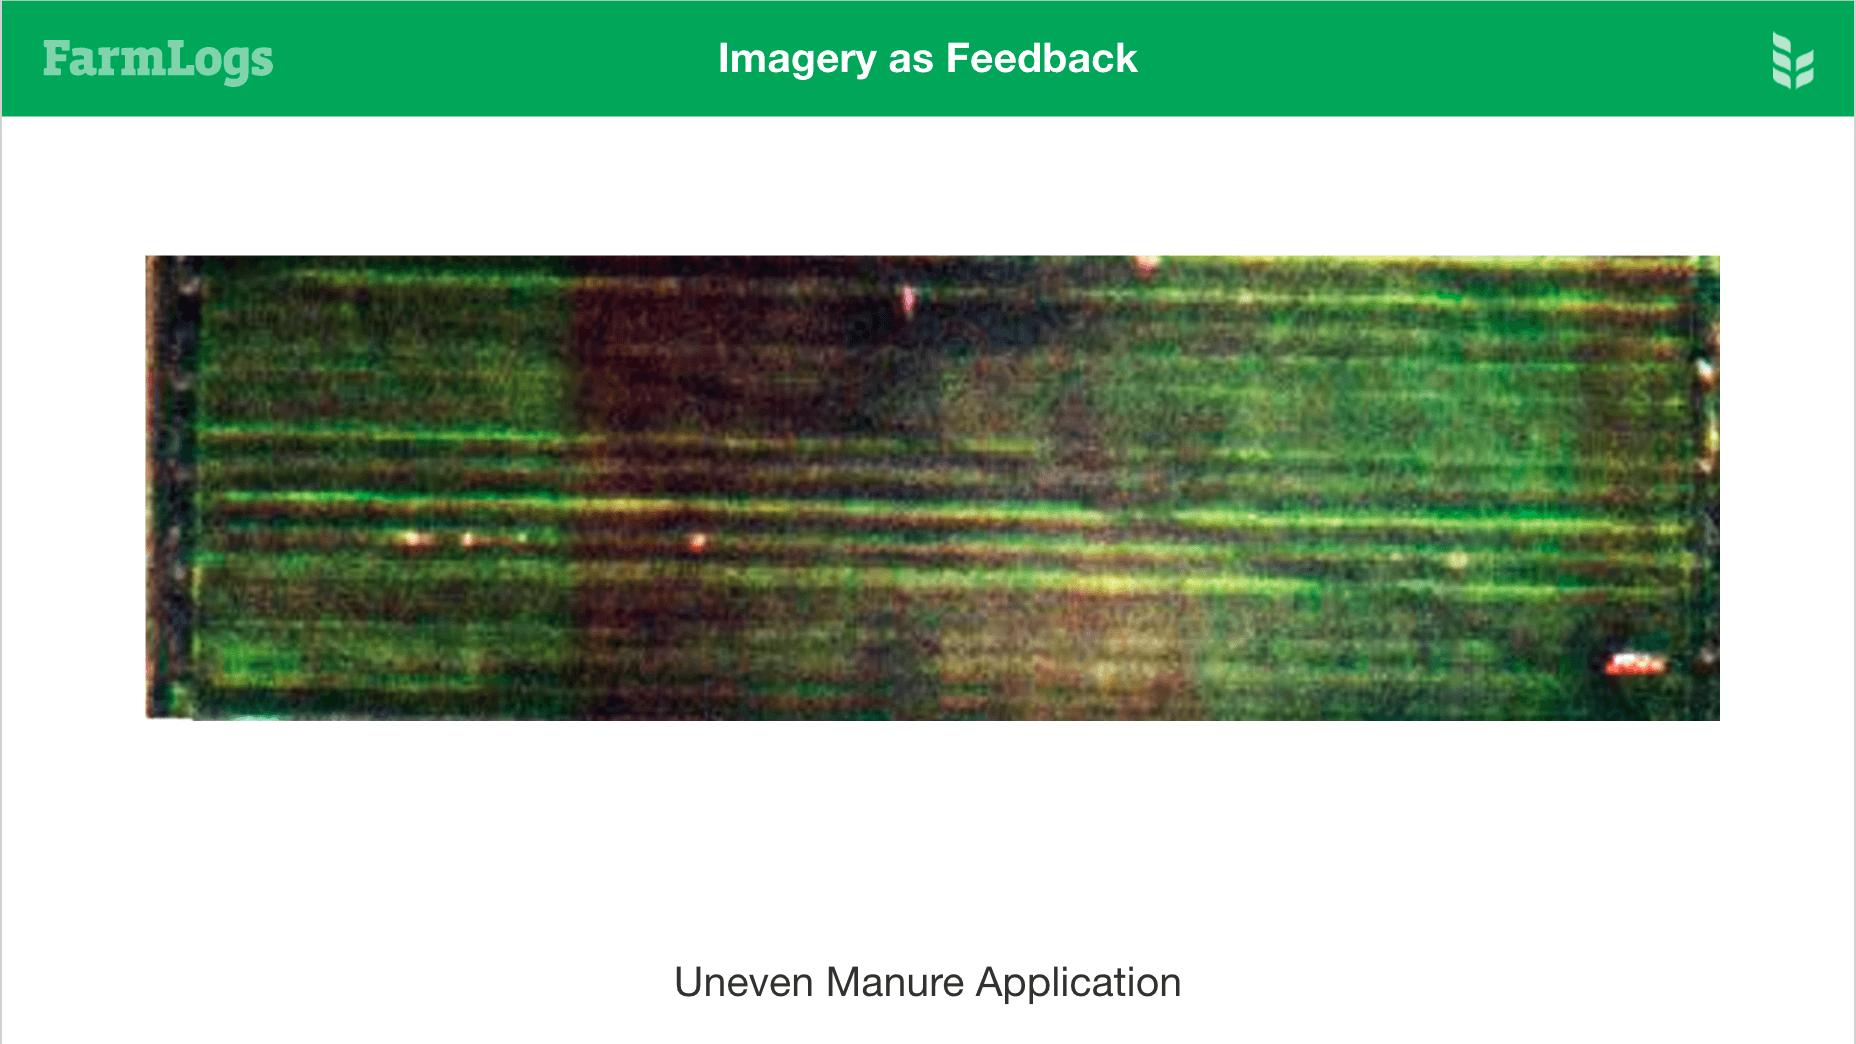 uneven-manure-application.png